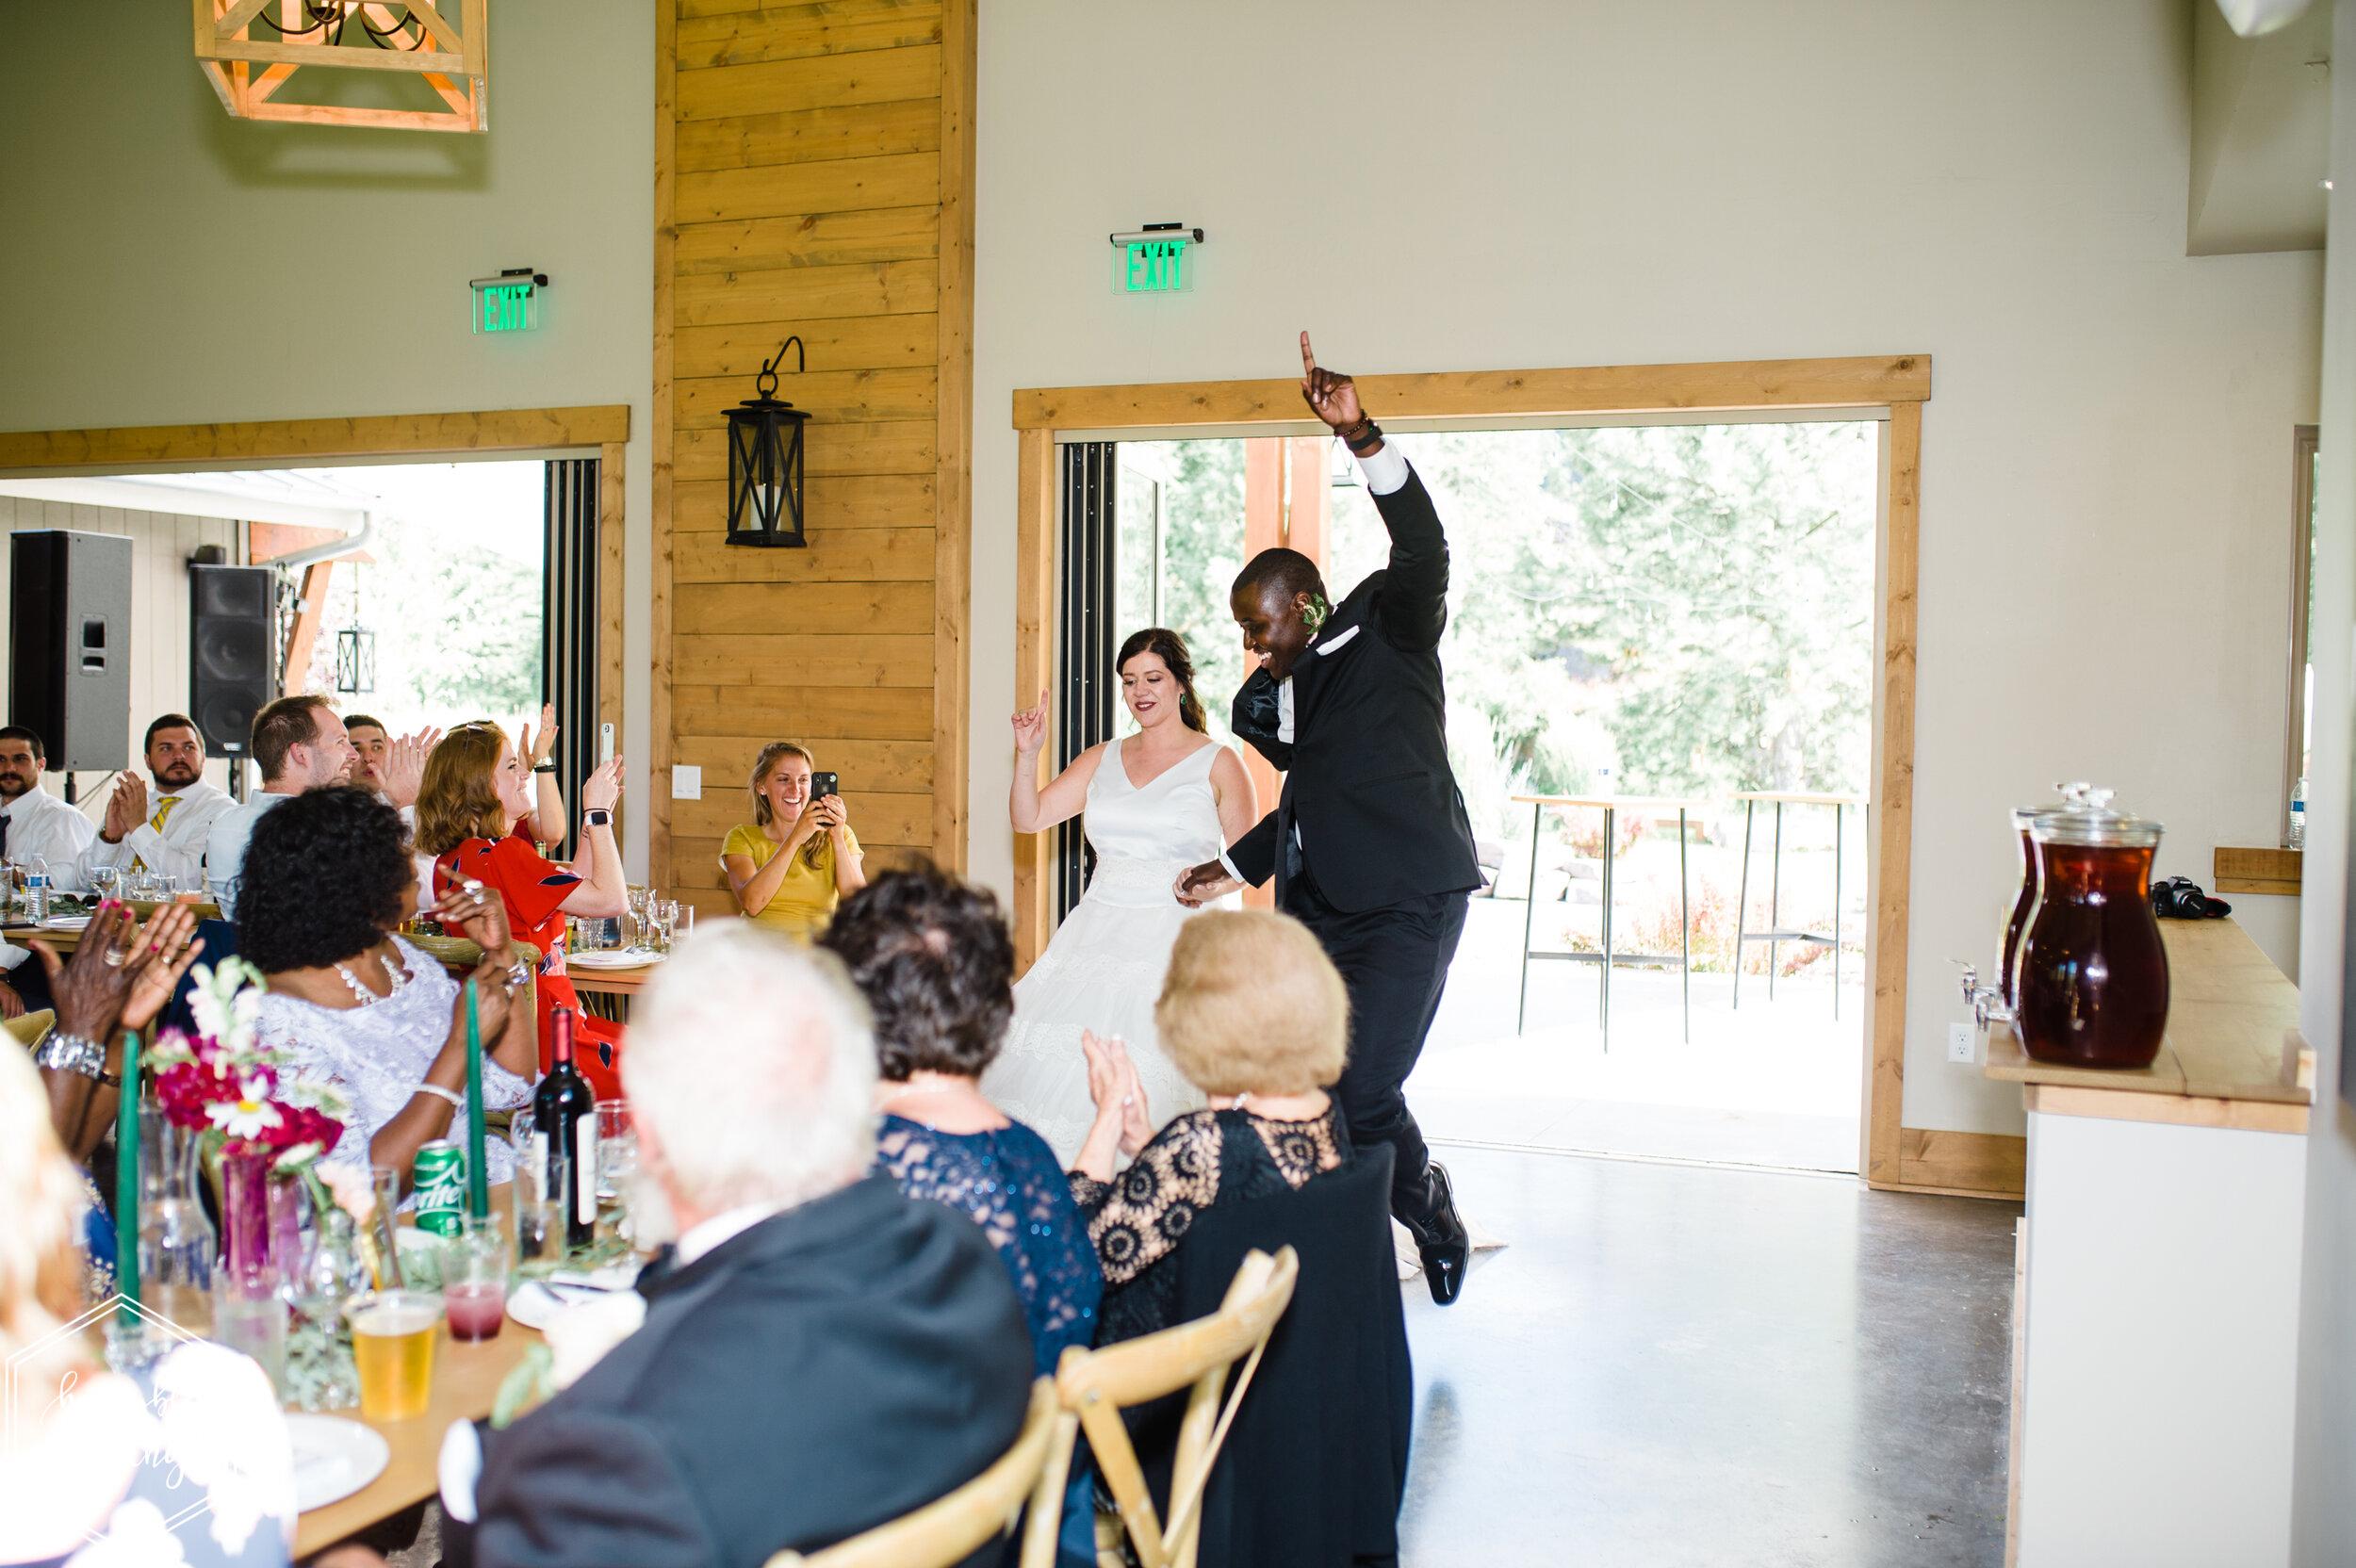 145White Raven Wedding_Montana Wedding Photographer_Rebekah & Likom_Honeybee Weddings_July 27, 2019-2203.jpg